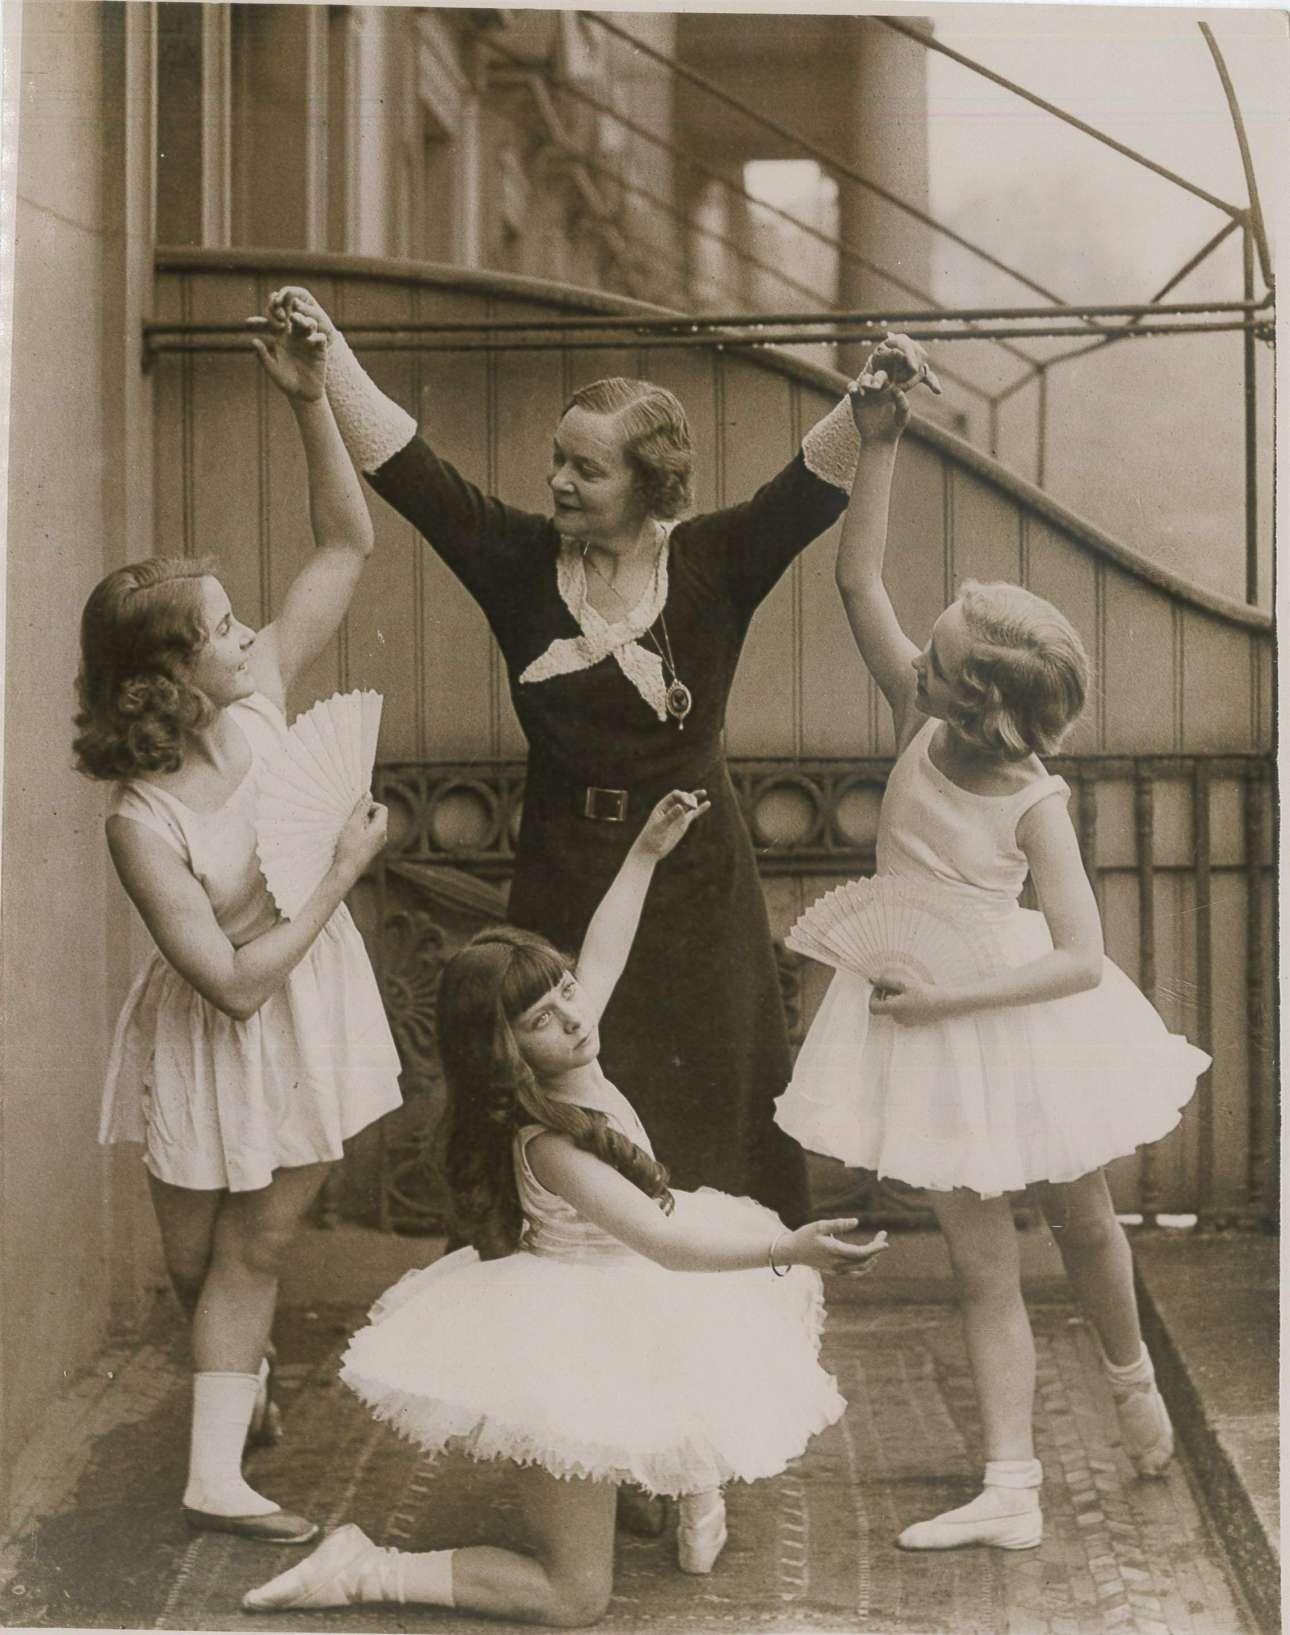 H καταξιωμένη μπαλαρίνα Αντελίν Ζενέ, μαζί με τα νεαρά μέλη του Συλλόγου Οπερατικού Χορού, πριν από πρωινή παράσταση σε θέατρο του Γουέστ Εντ το 1932